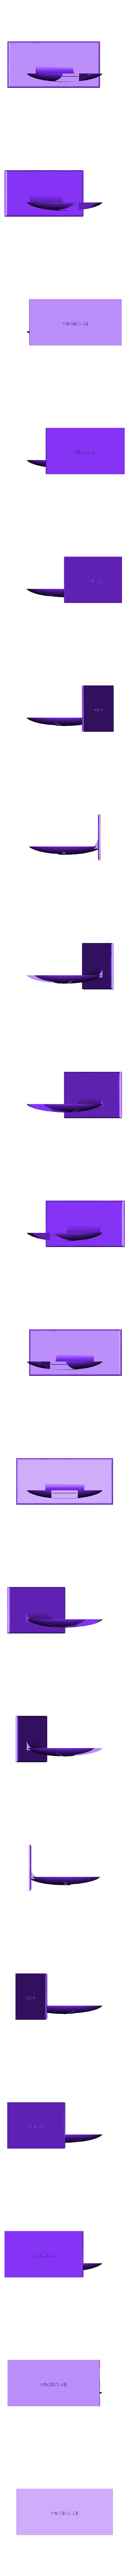 modif_moustic8.stl Download free STL file La spirale de la mort • Design to 3D print, Cyborg